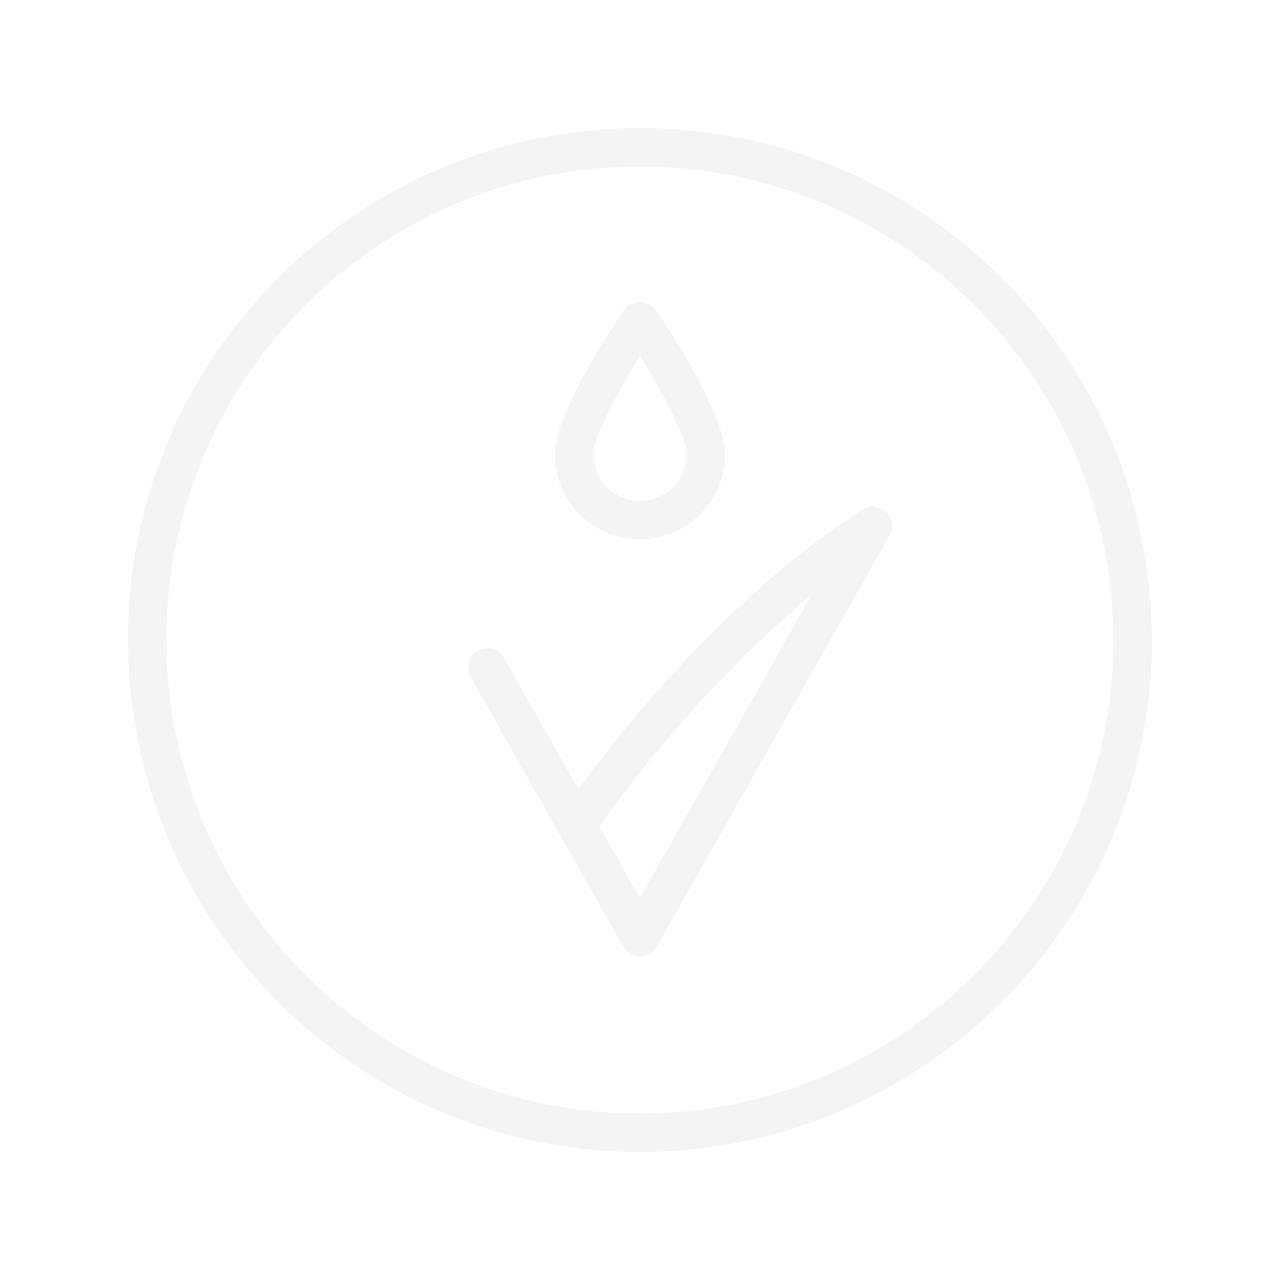 Clarins Instant Light Lip Comfort Oil No.01 Honey 7ml